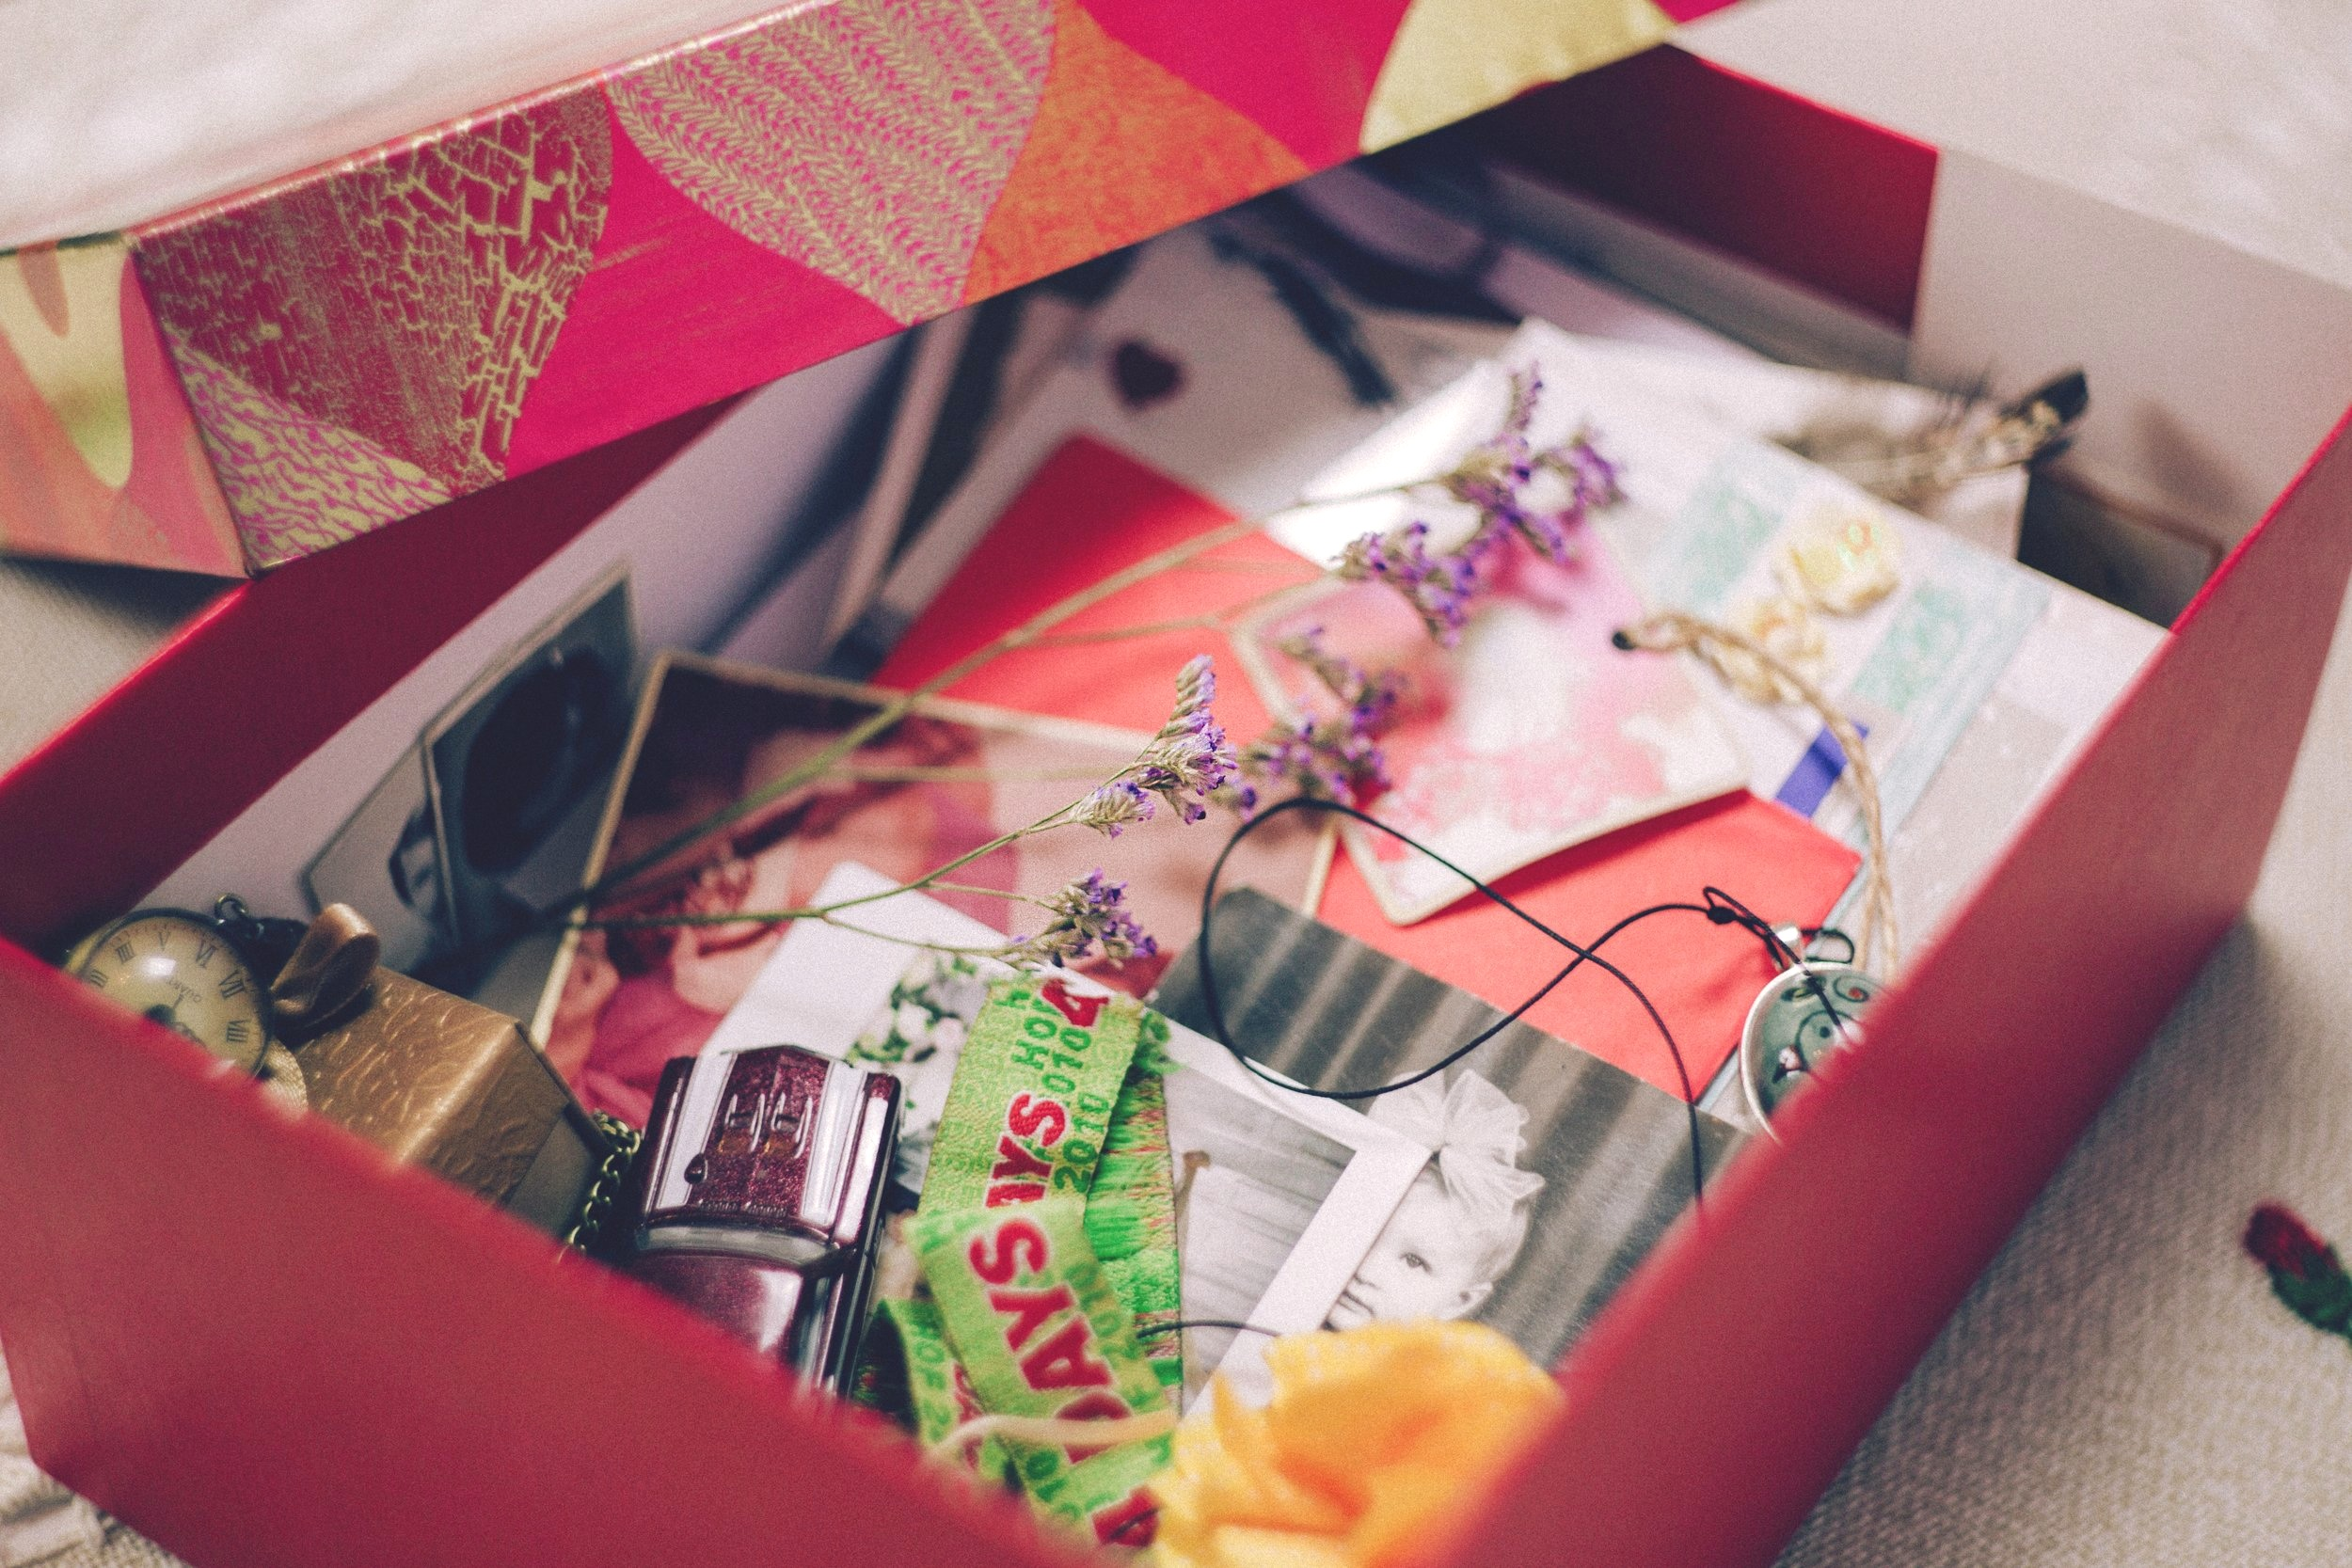 A box full of sentimental items